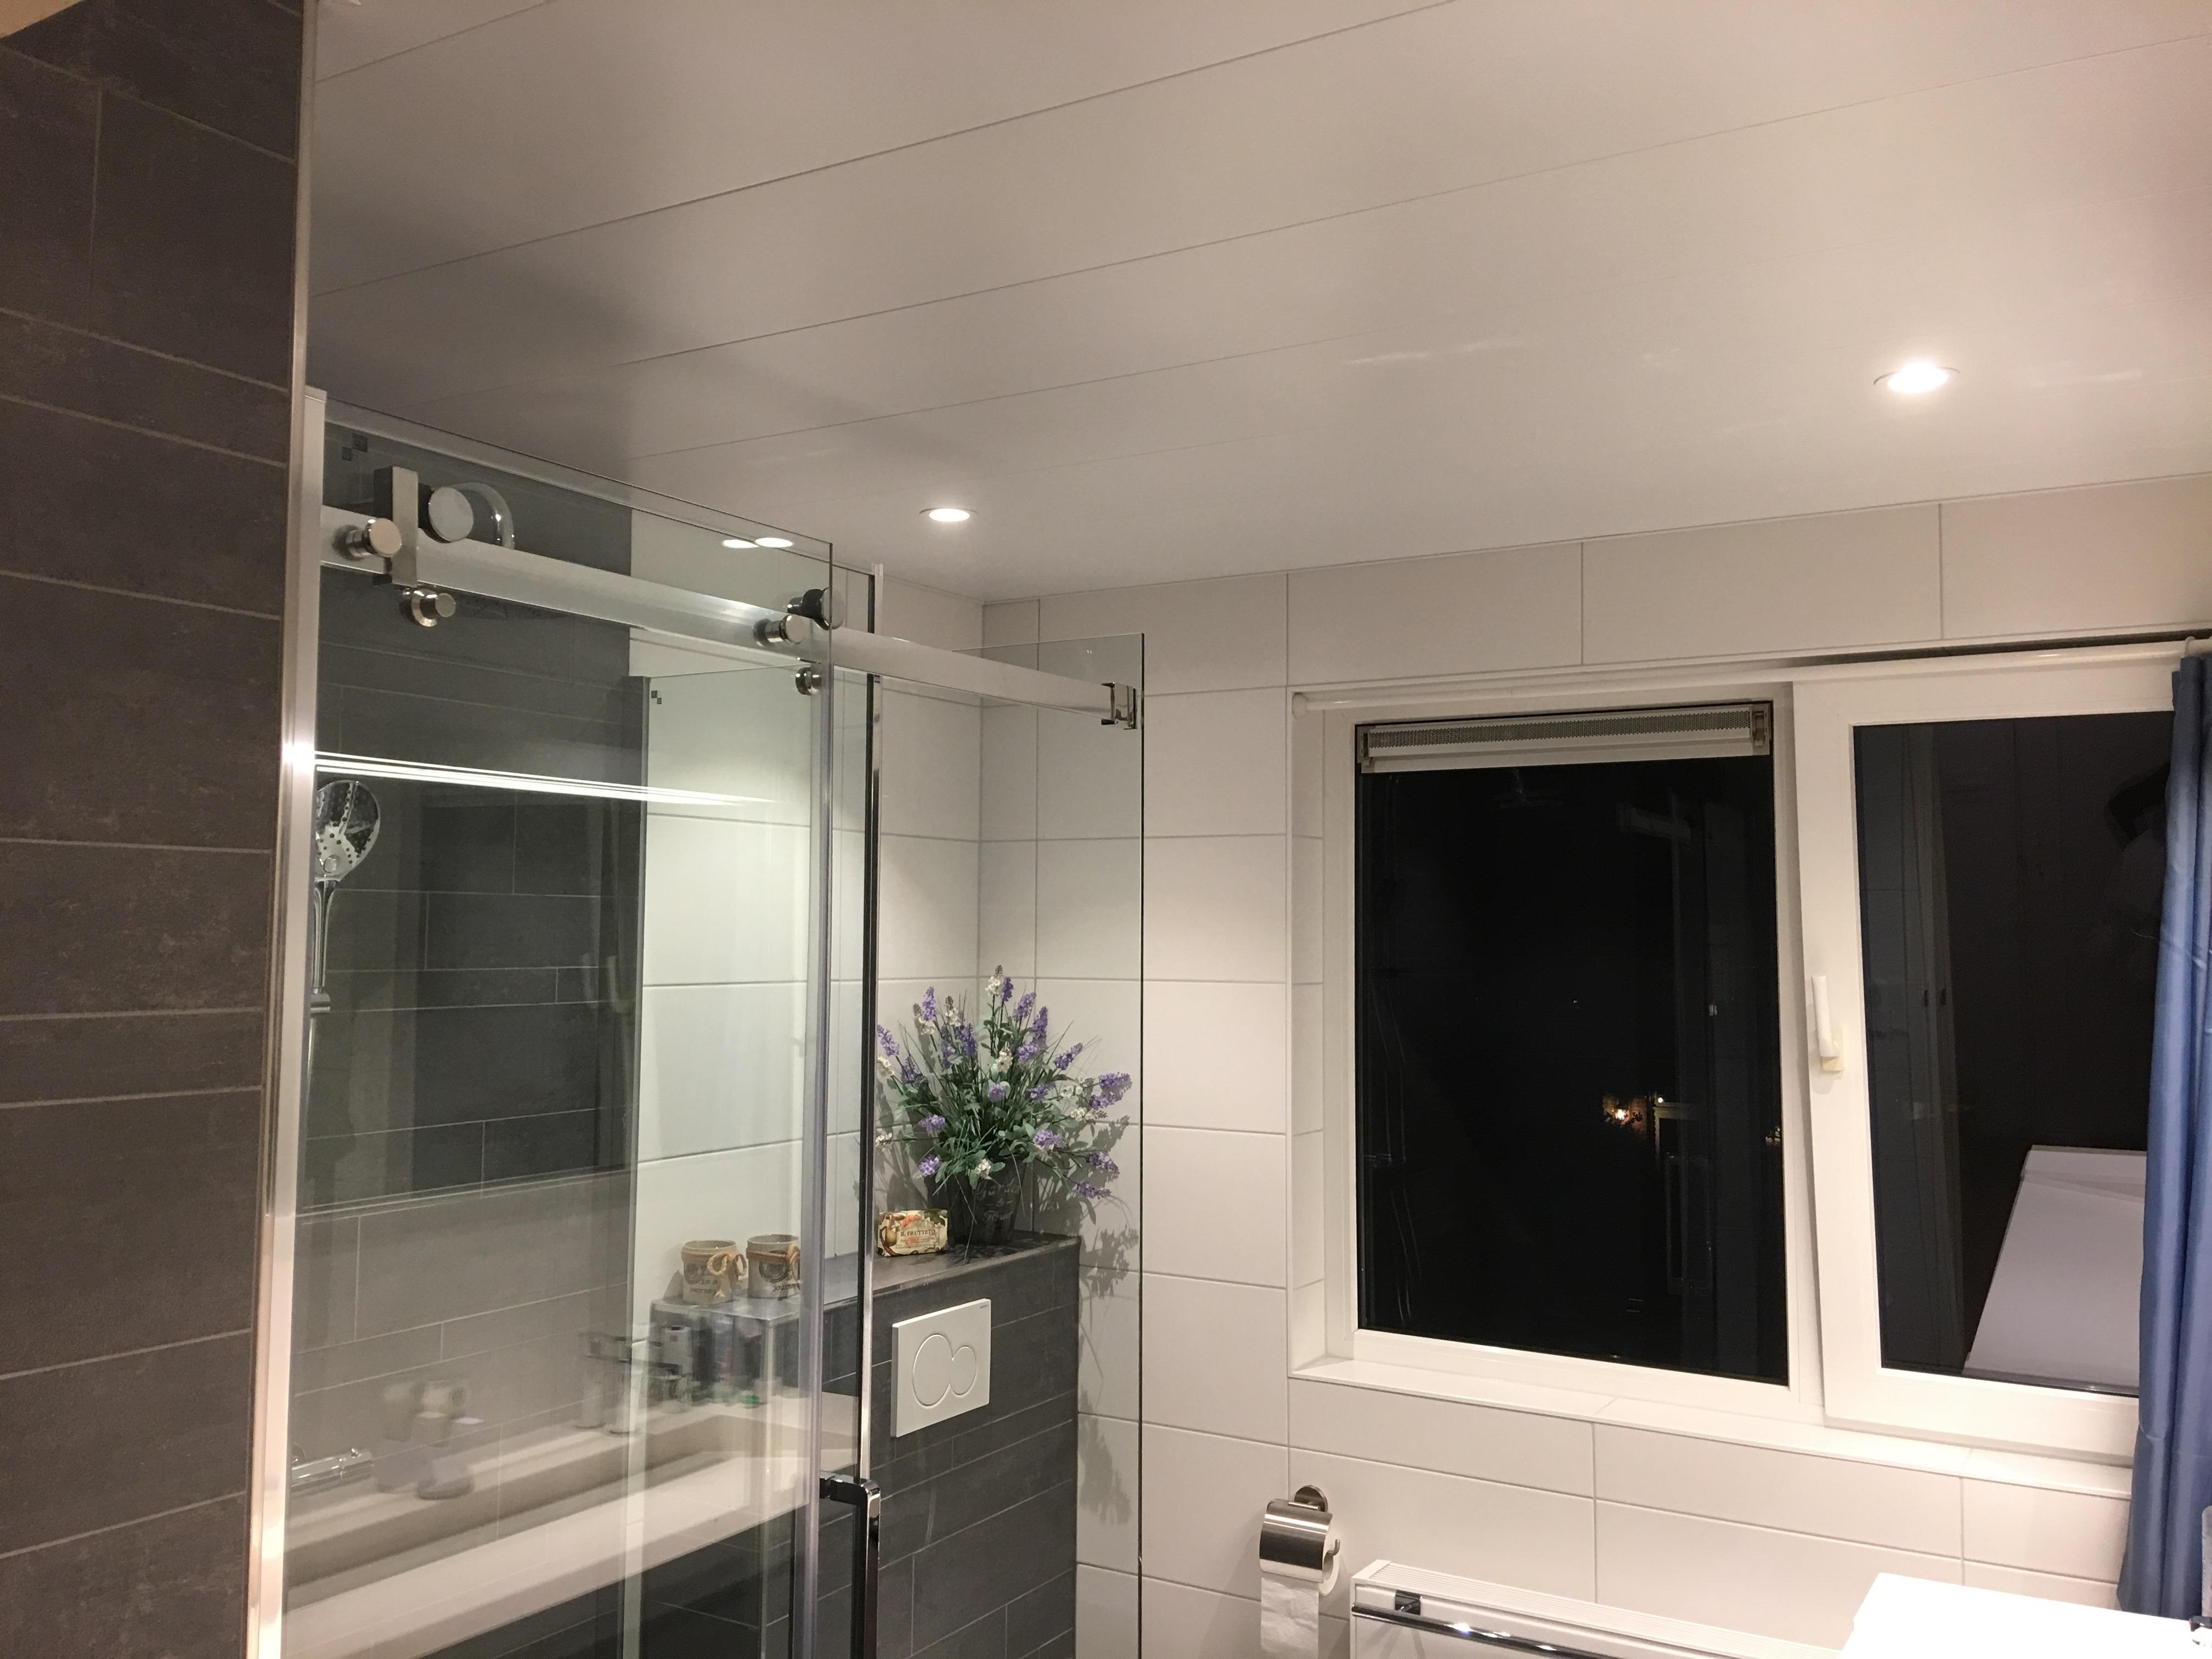 Budget Complete Badkamer : Compact budget badkamer ⋆ wiesenekker badkamerconcepten